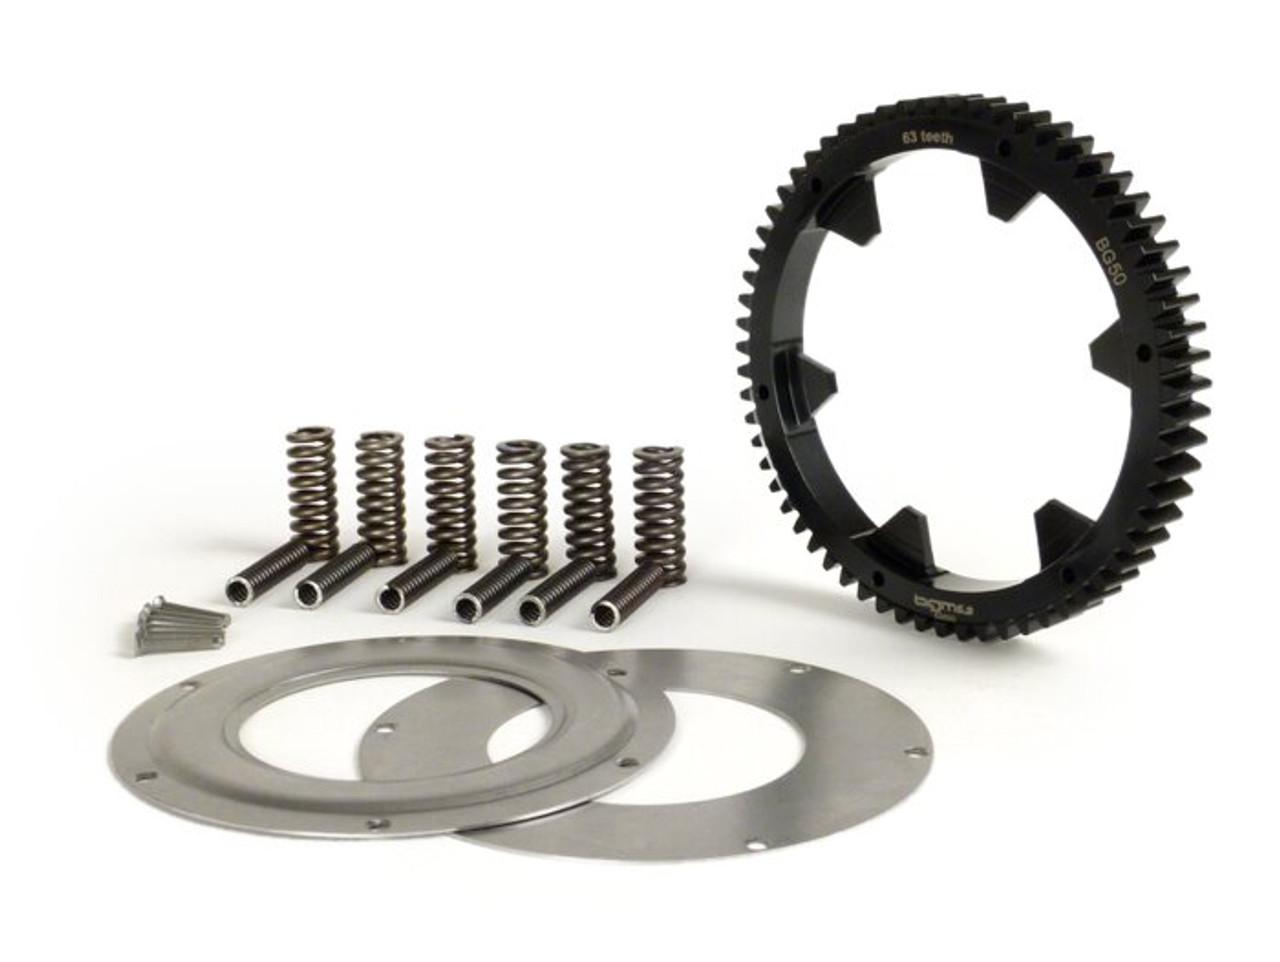 Vespa Primary Drive Gear Kit 63T Straight BGM PRO - PX/Rally (C39-BGM6263GKT)